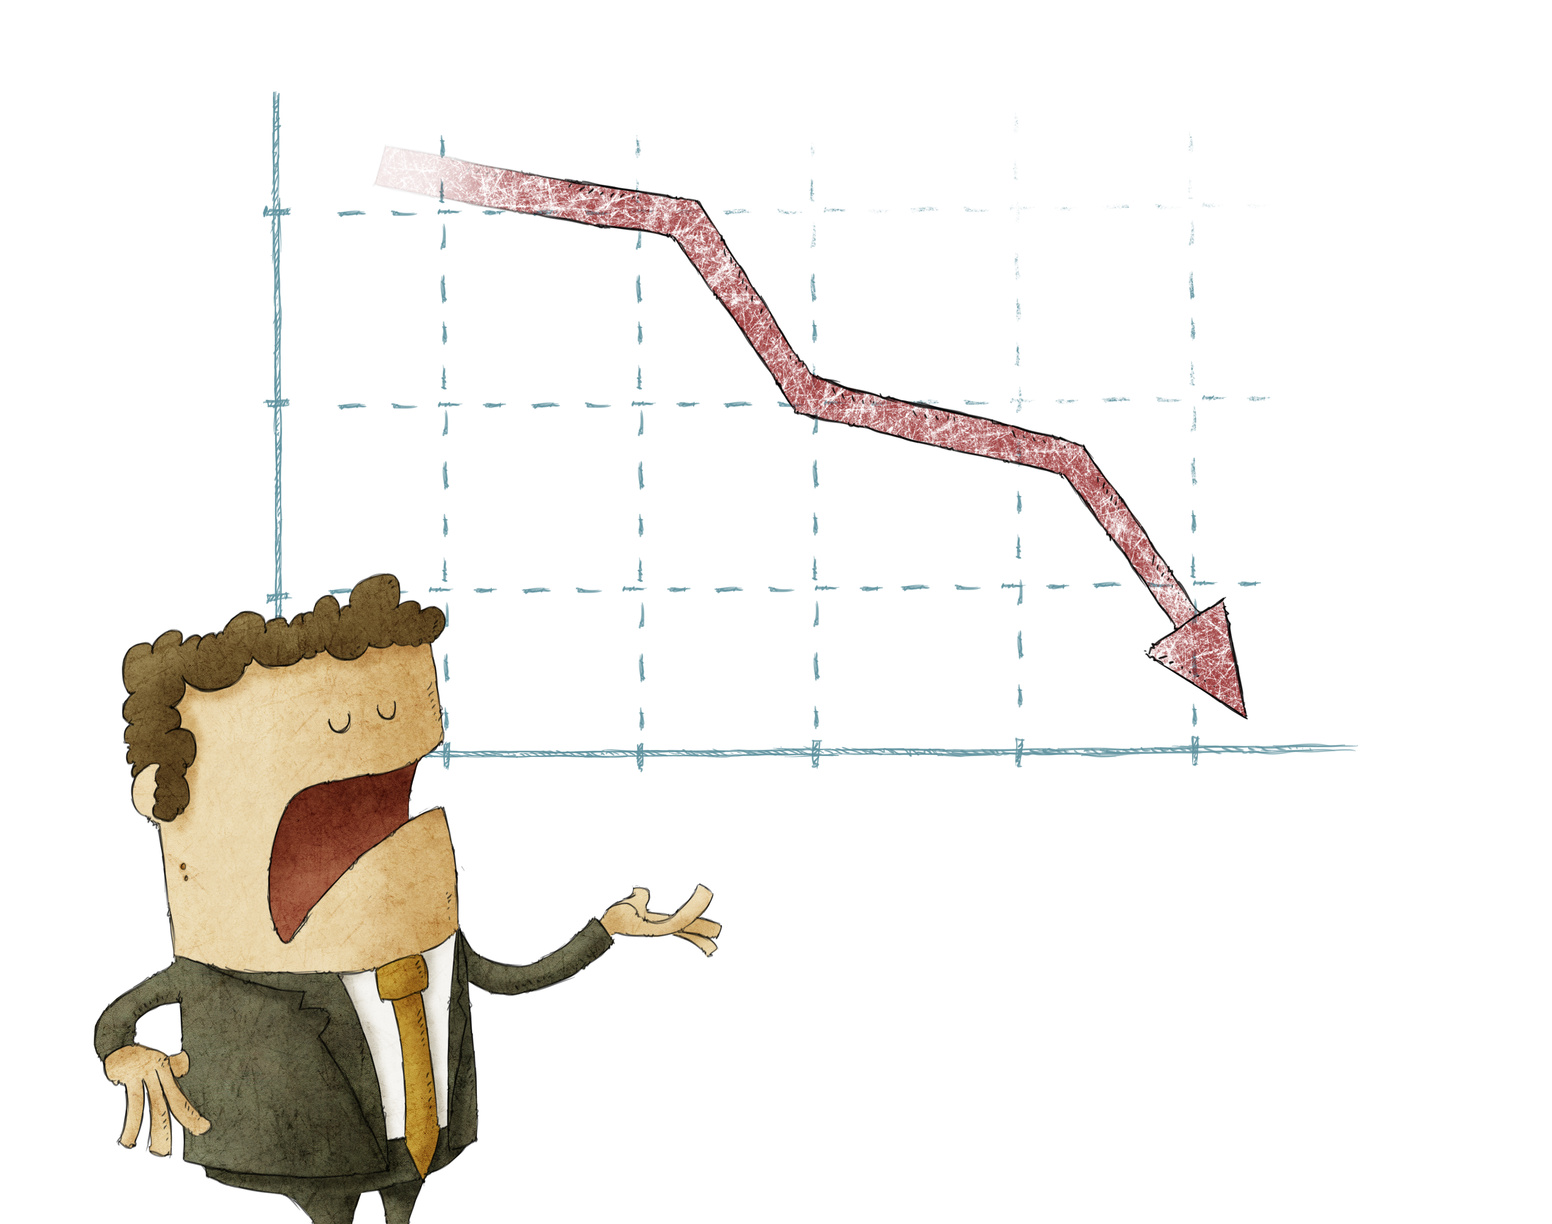 global growth downgrade